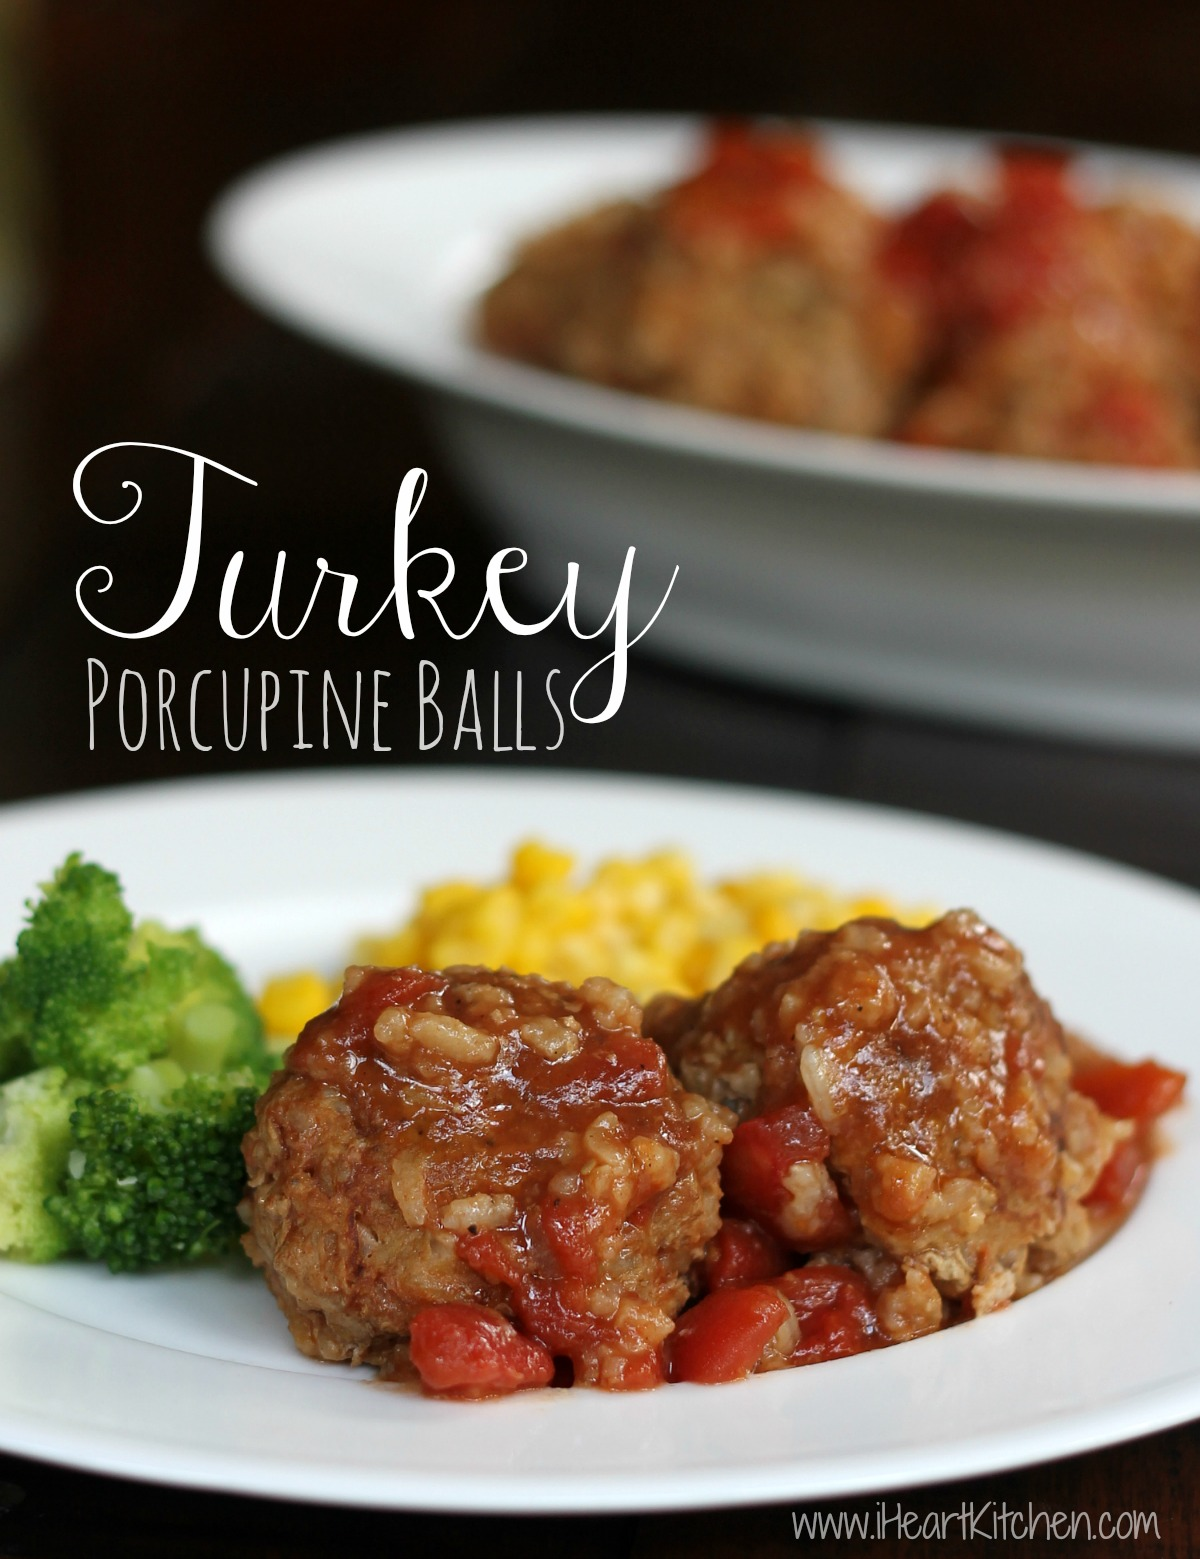 Turkey Porcupine Balls